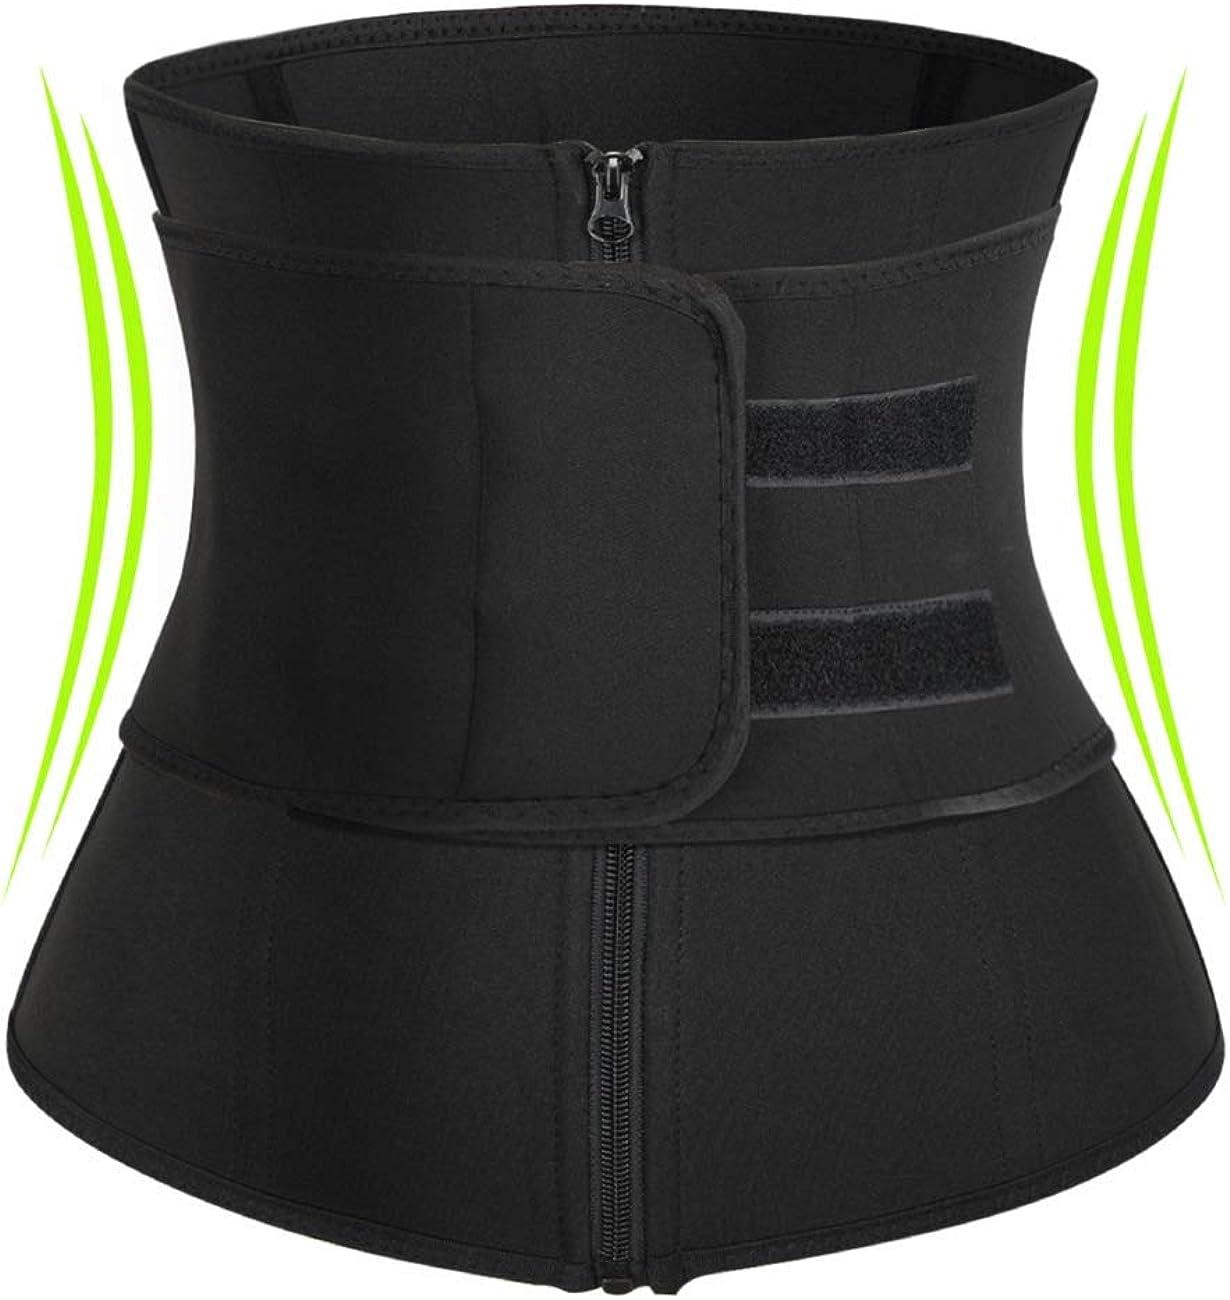 for Trainer Waist rose coastal Women Shaper Body Belt Workout ...